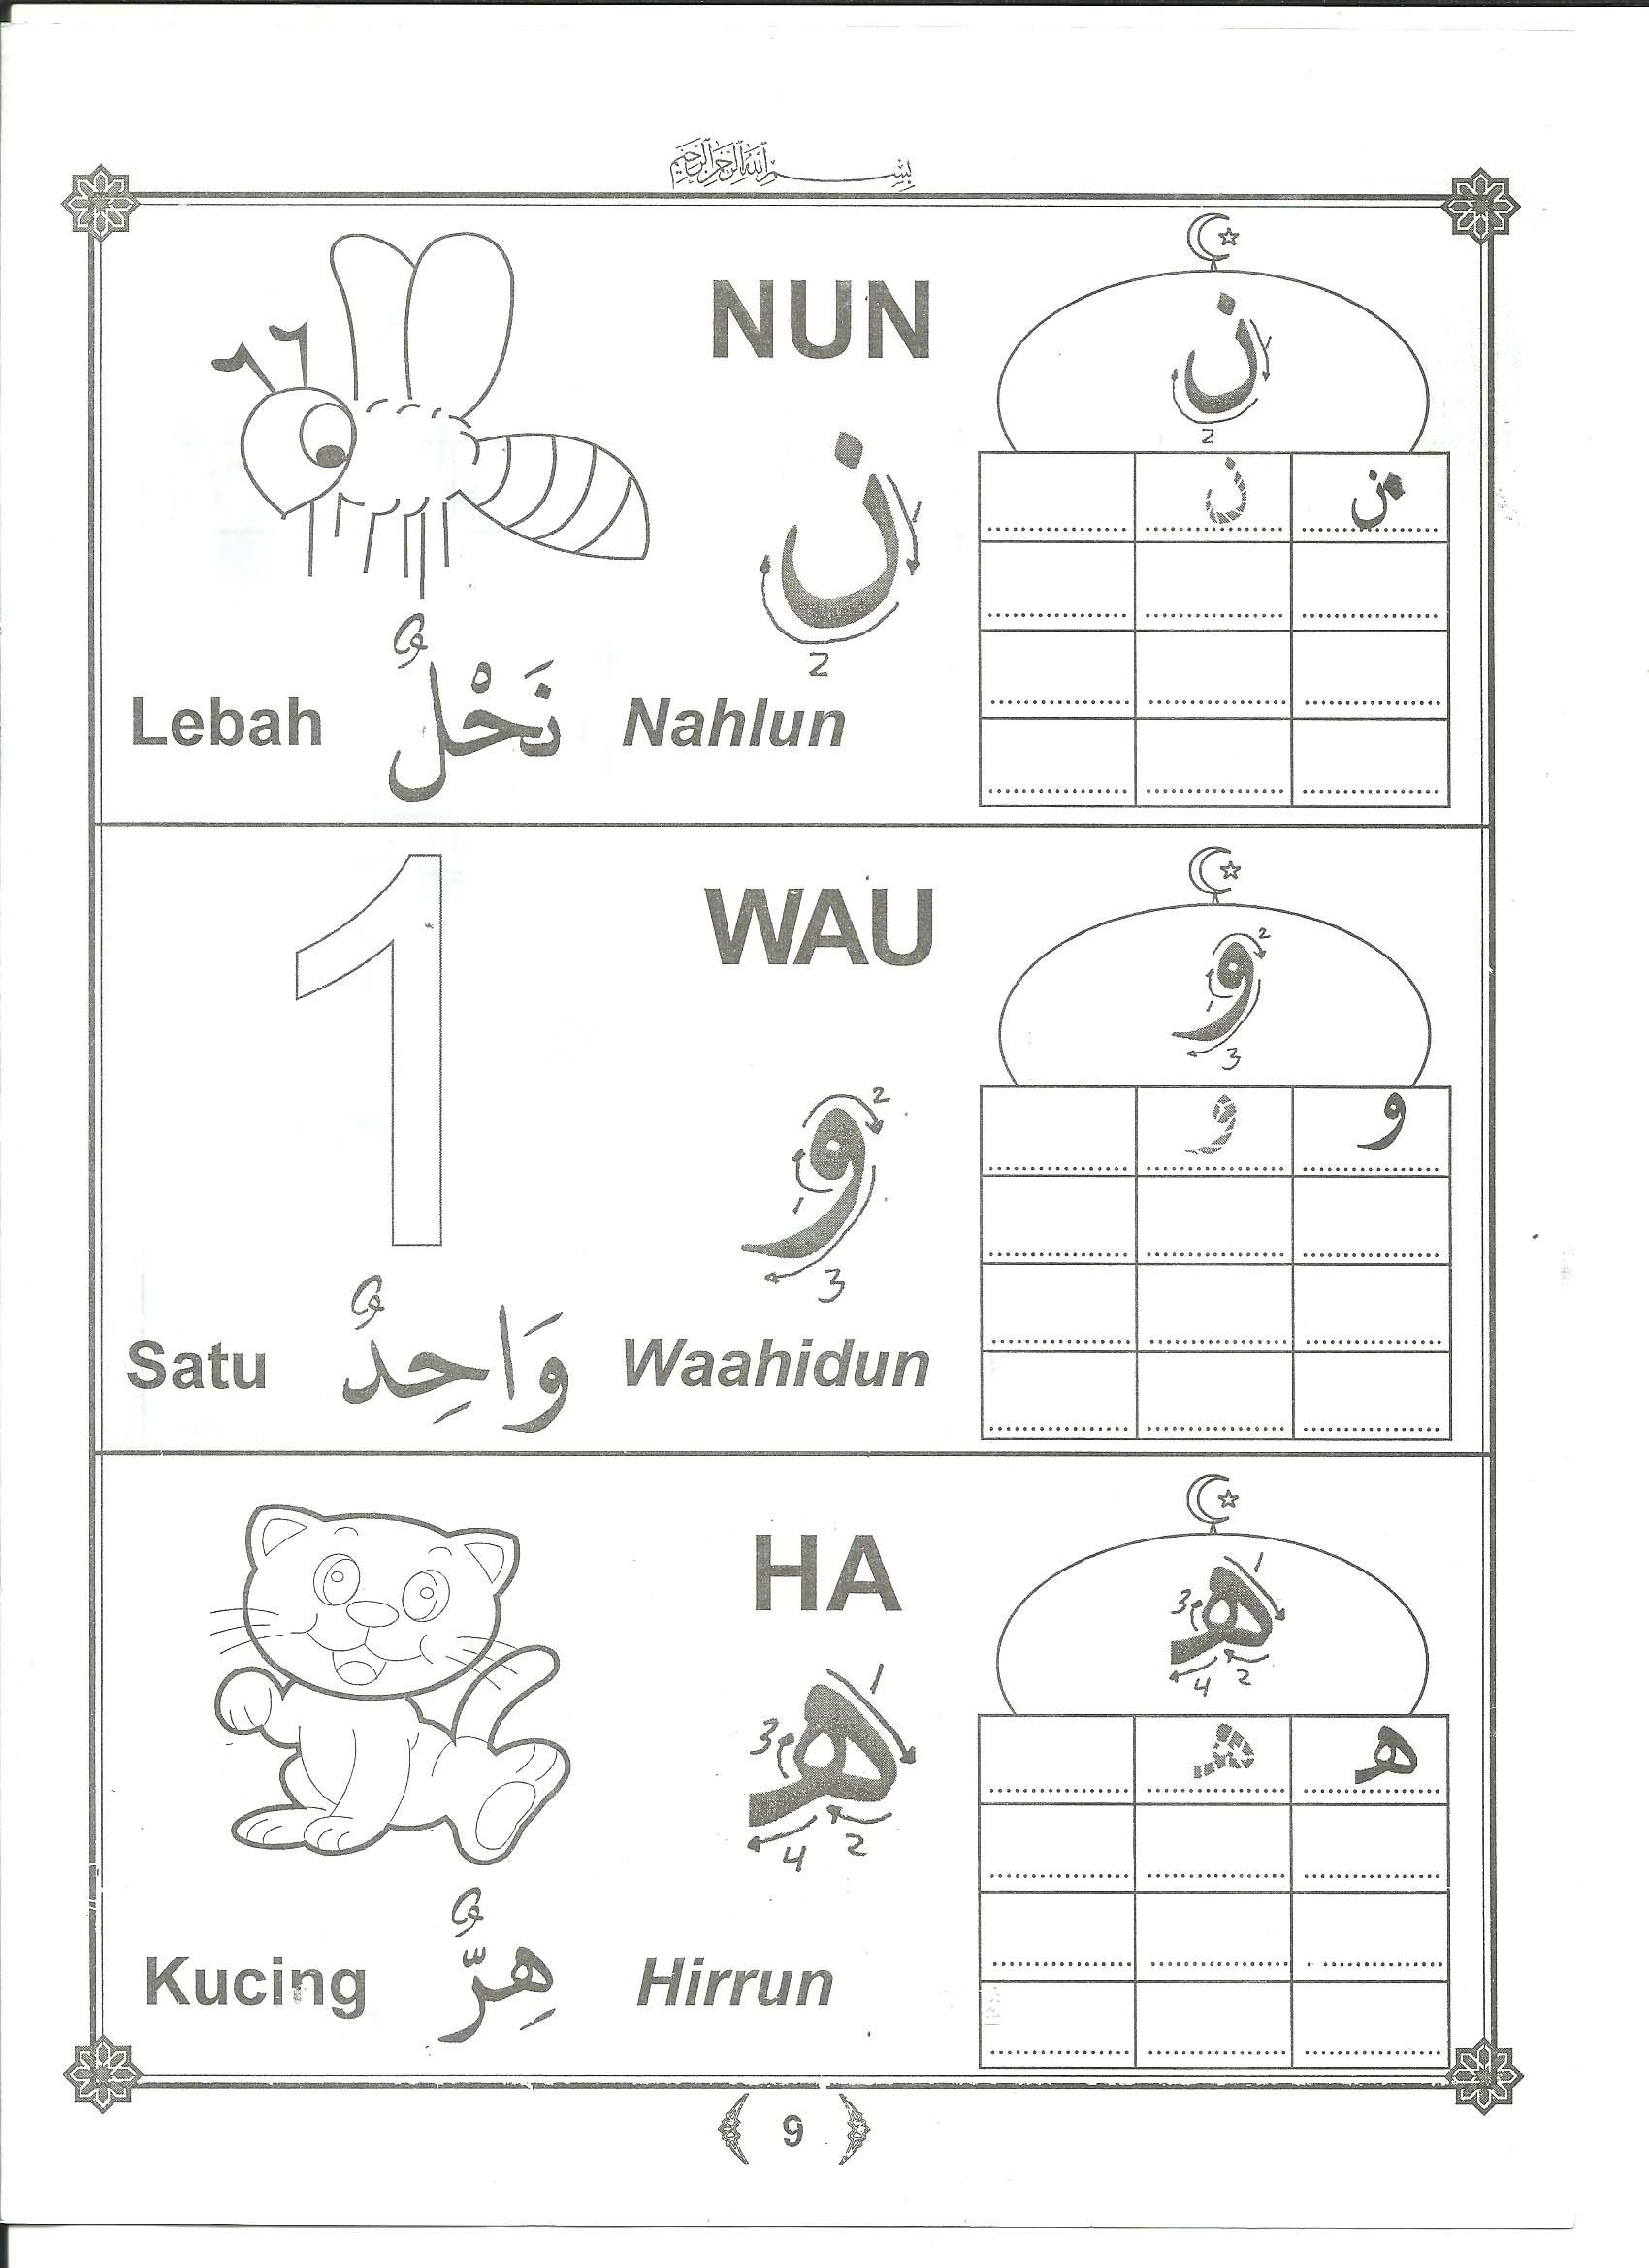 belajar mewarnai menulis huruf hijaiyah angka arab 9